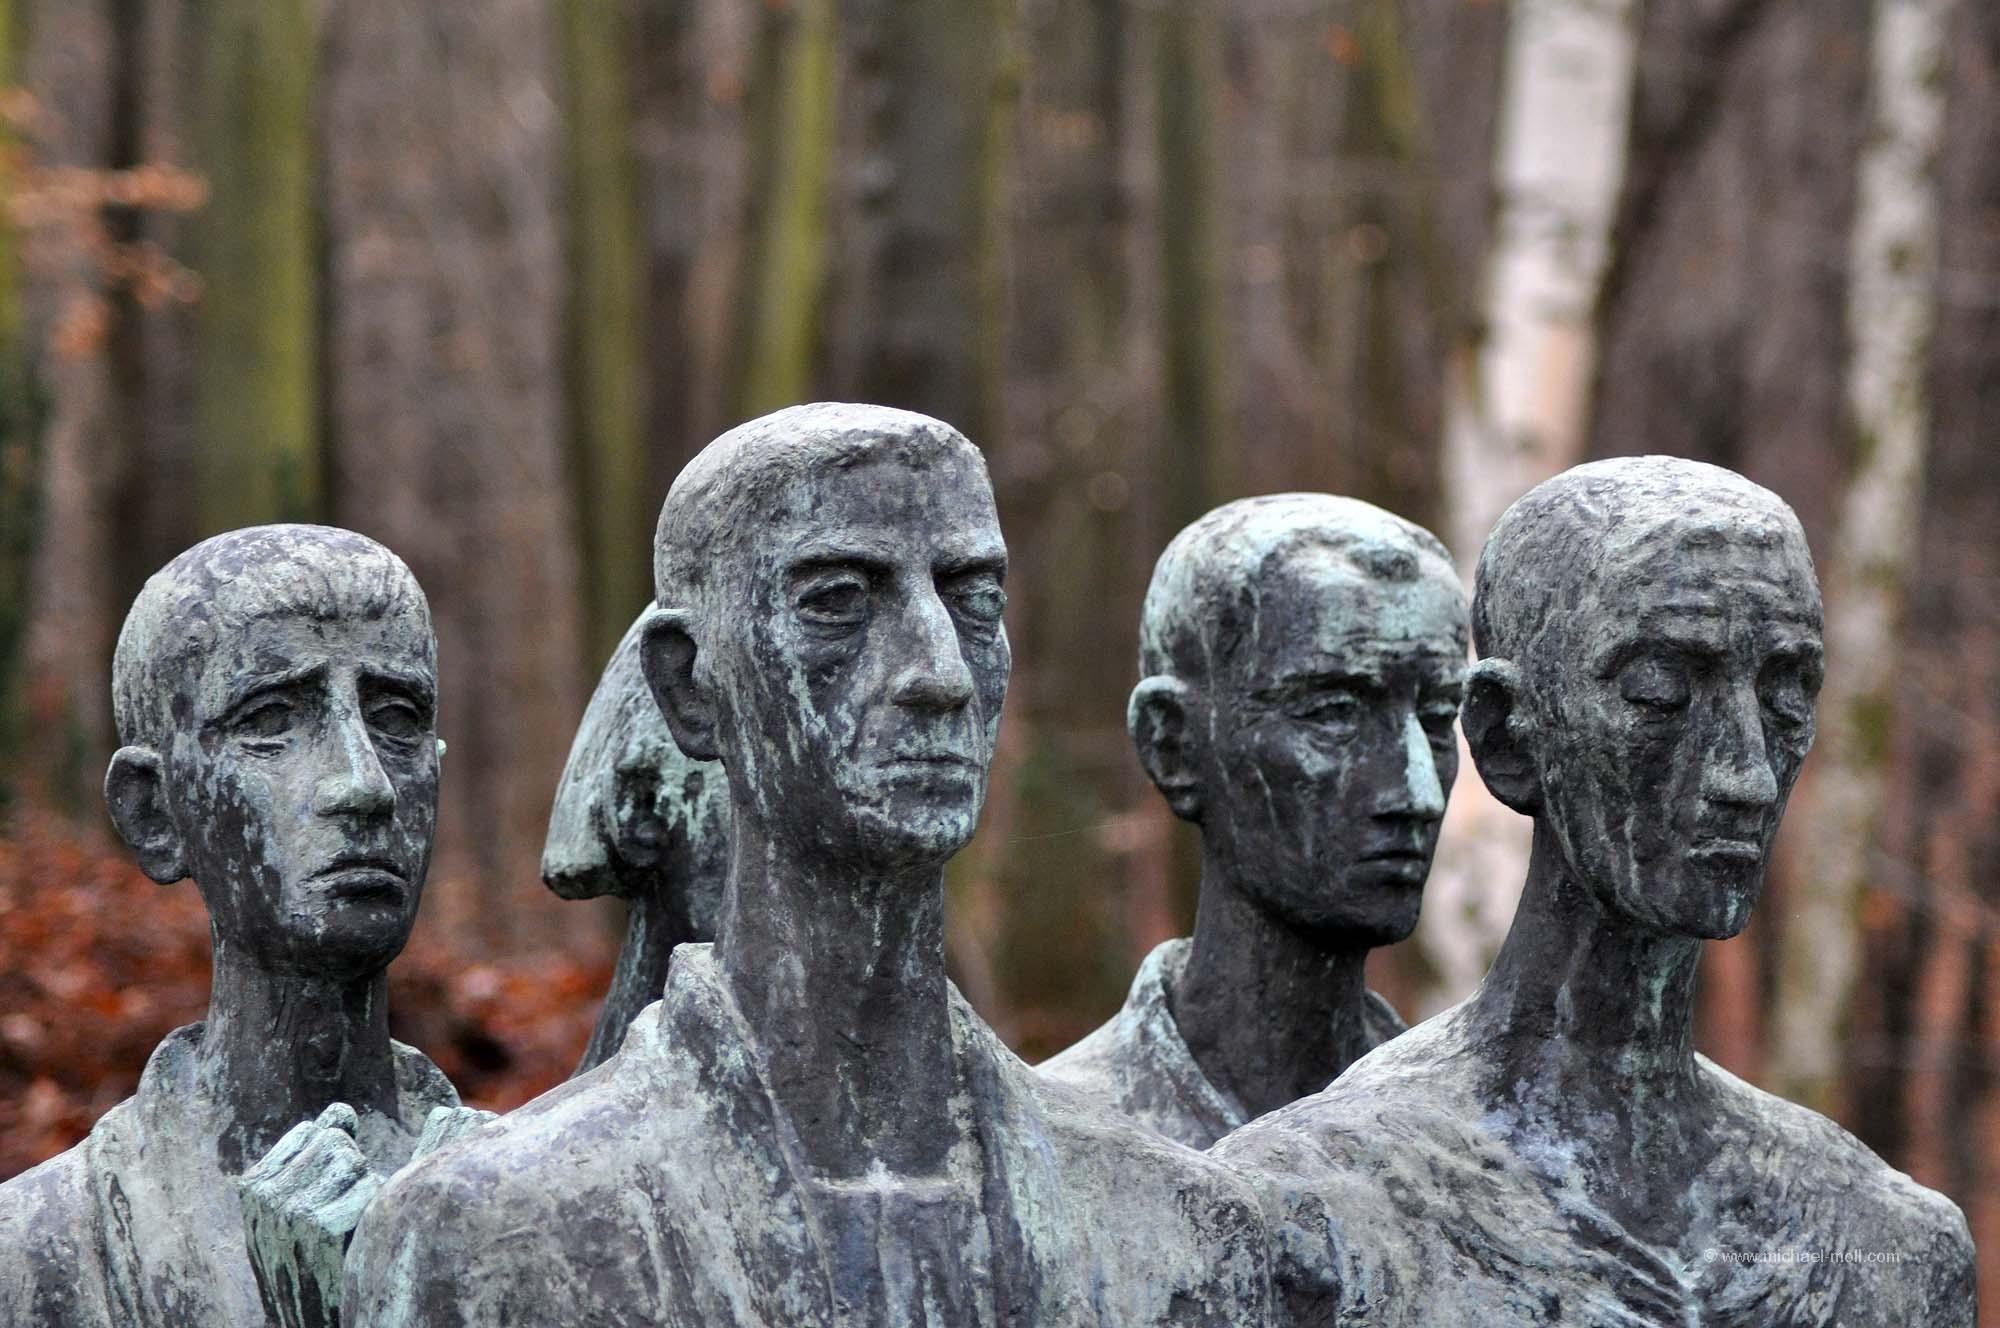 Skulptur in Dora-Mittelbau